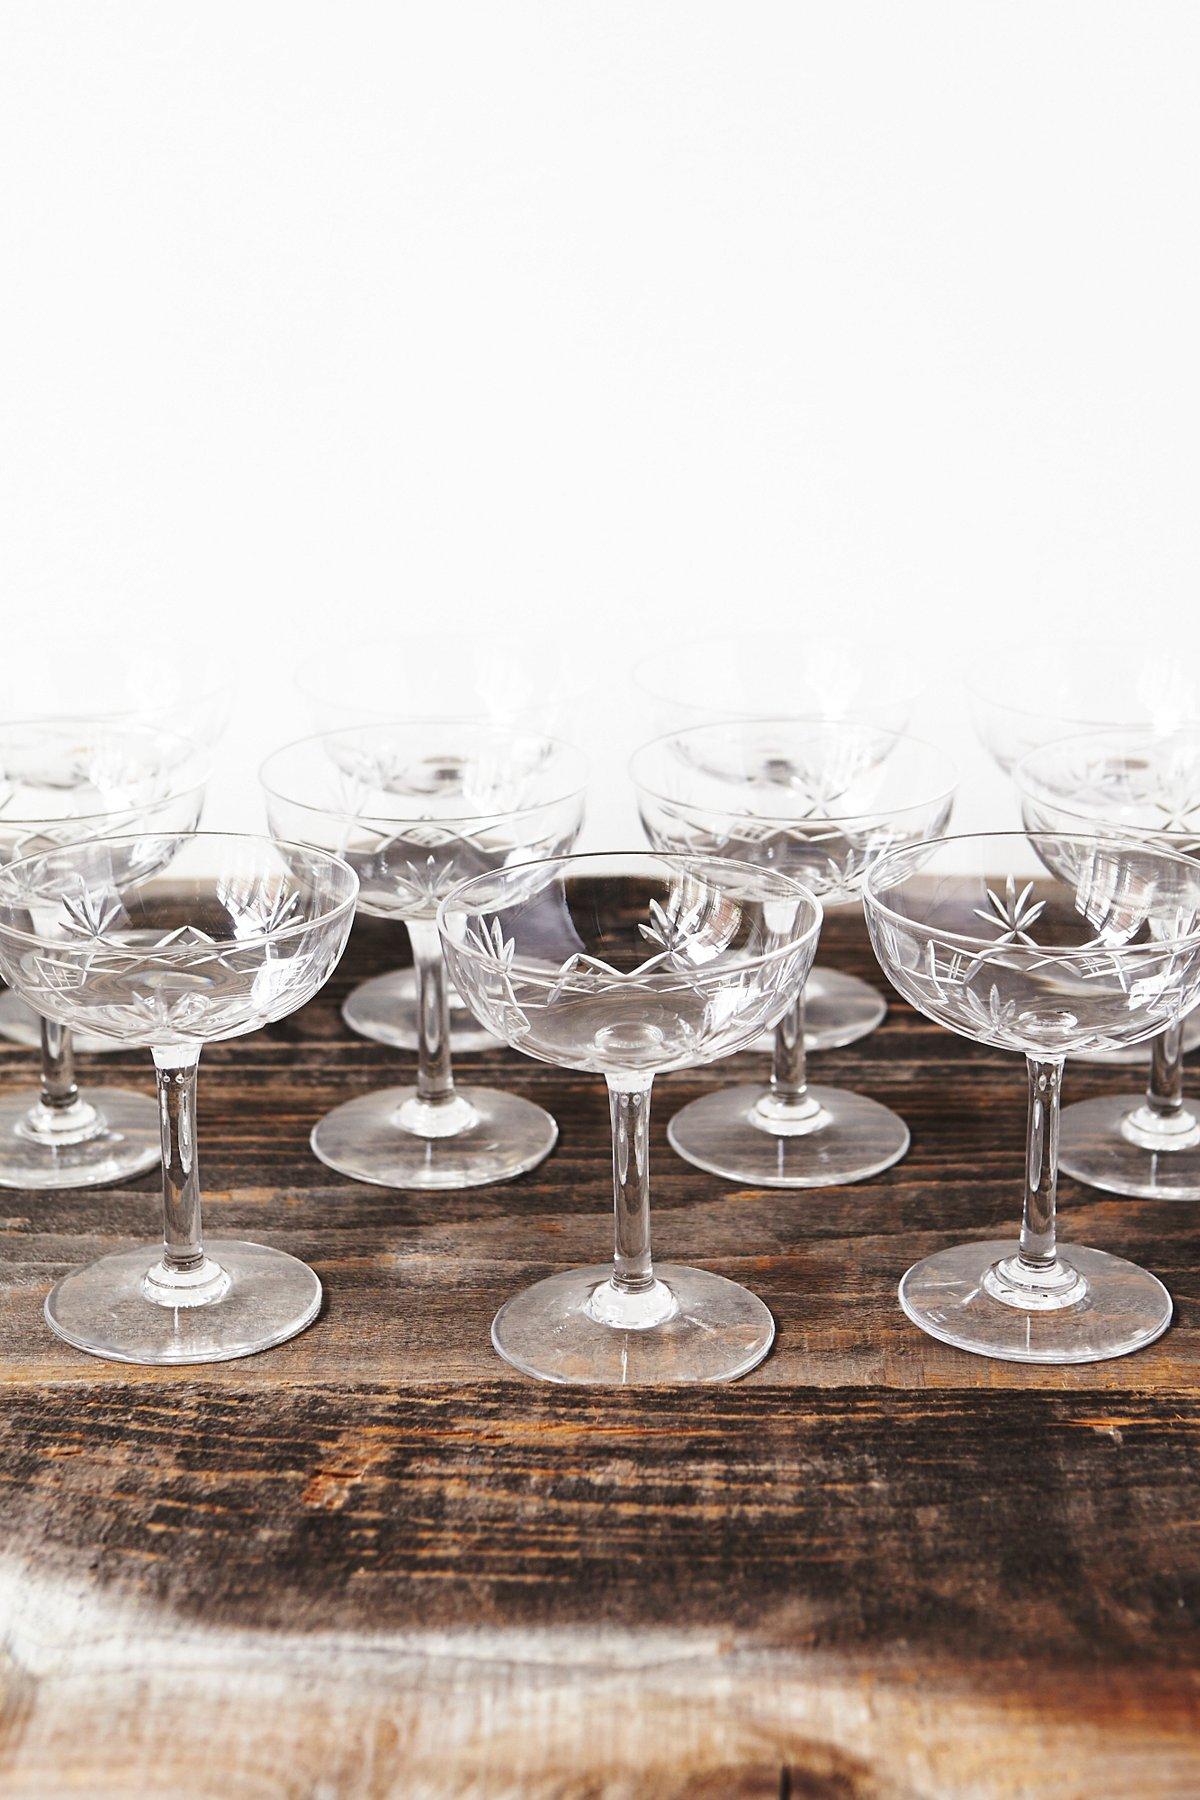 Vintage Loves One of a Kind Champagne Glasses